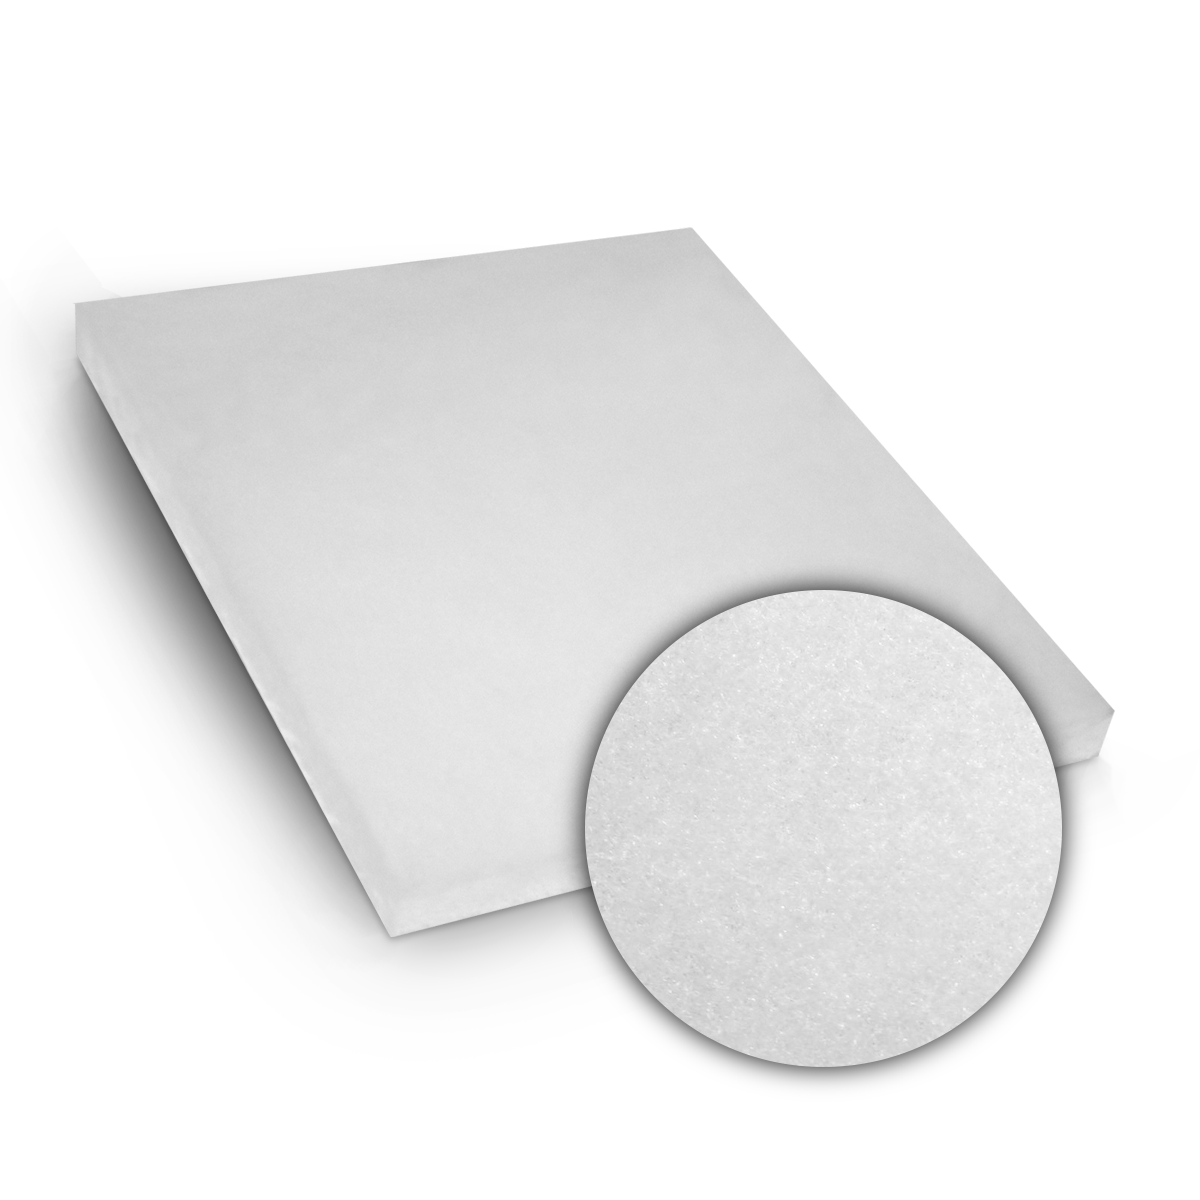 16x20x1 Sure-Fit LEVEL 10 MERV 10 Anti-Microbial Pad